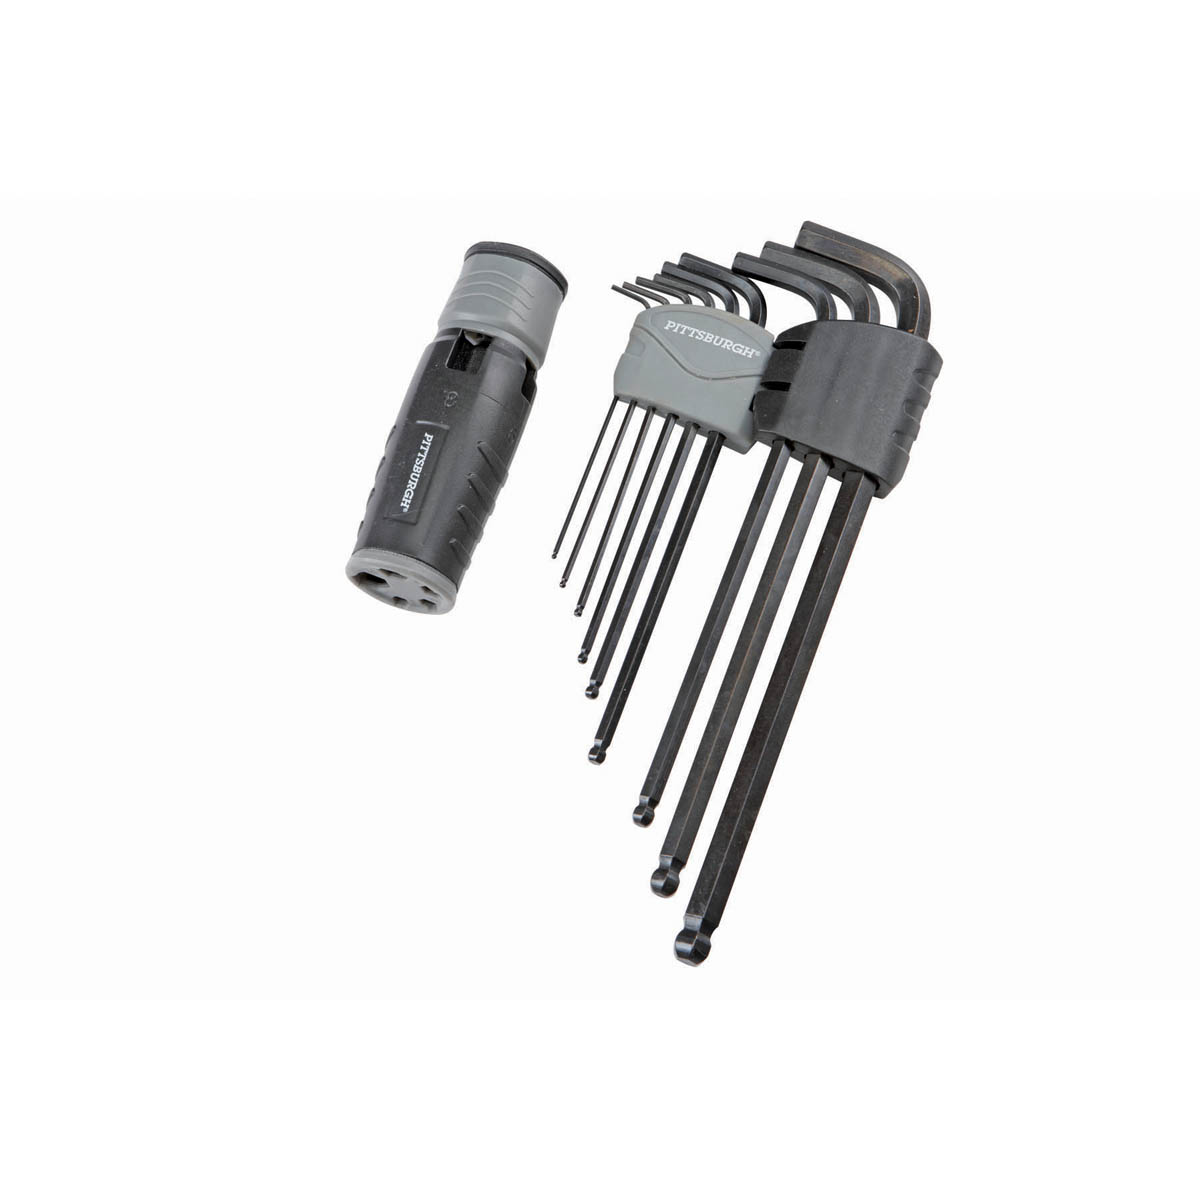 PITTSBURGH Metric Hex Key System 9 Pc. - Item 69084 / 95037